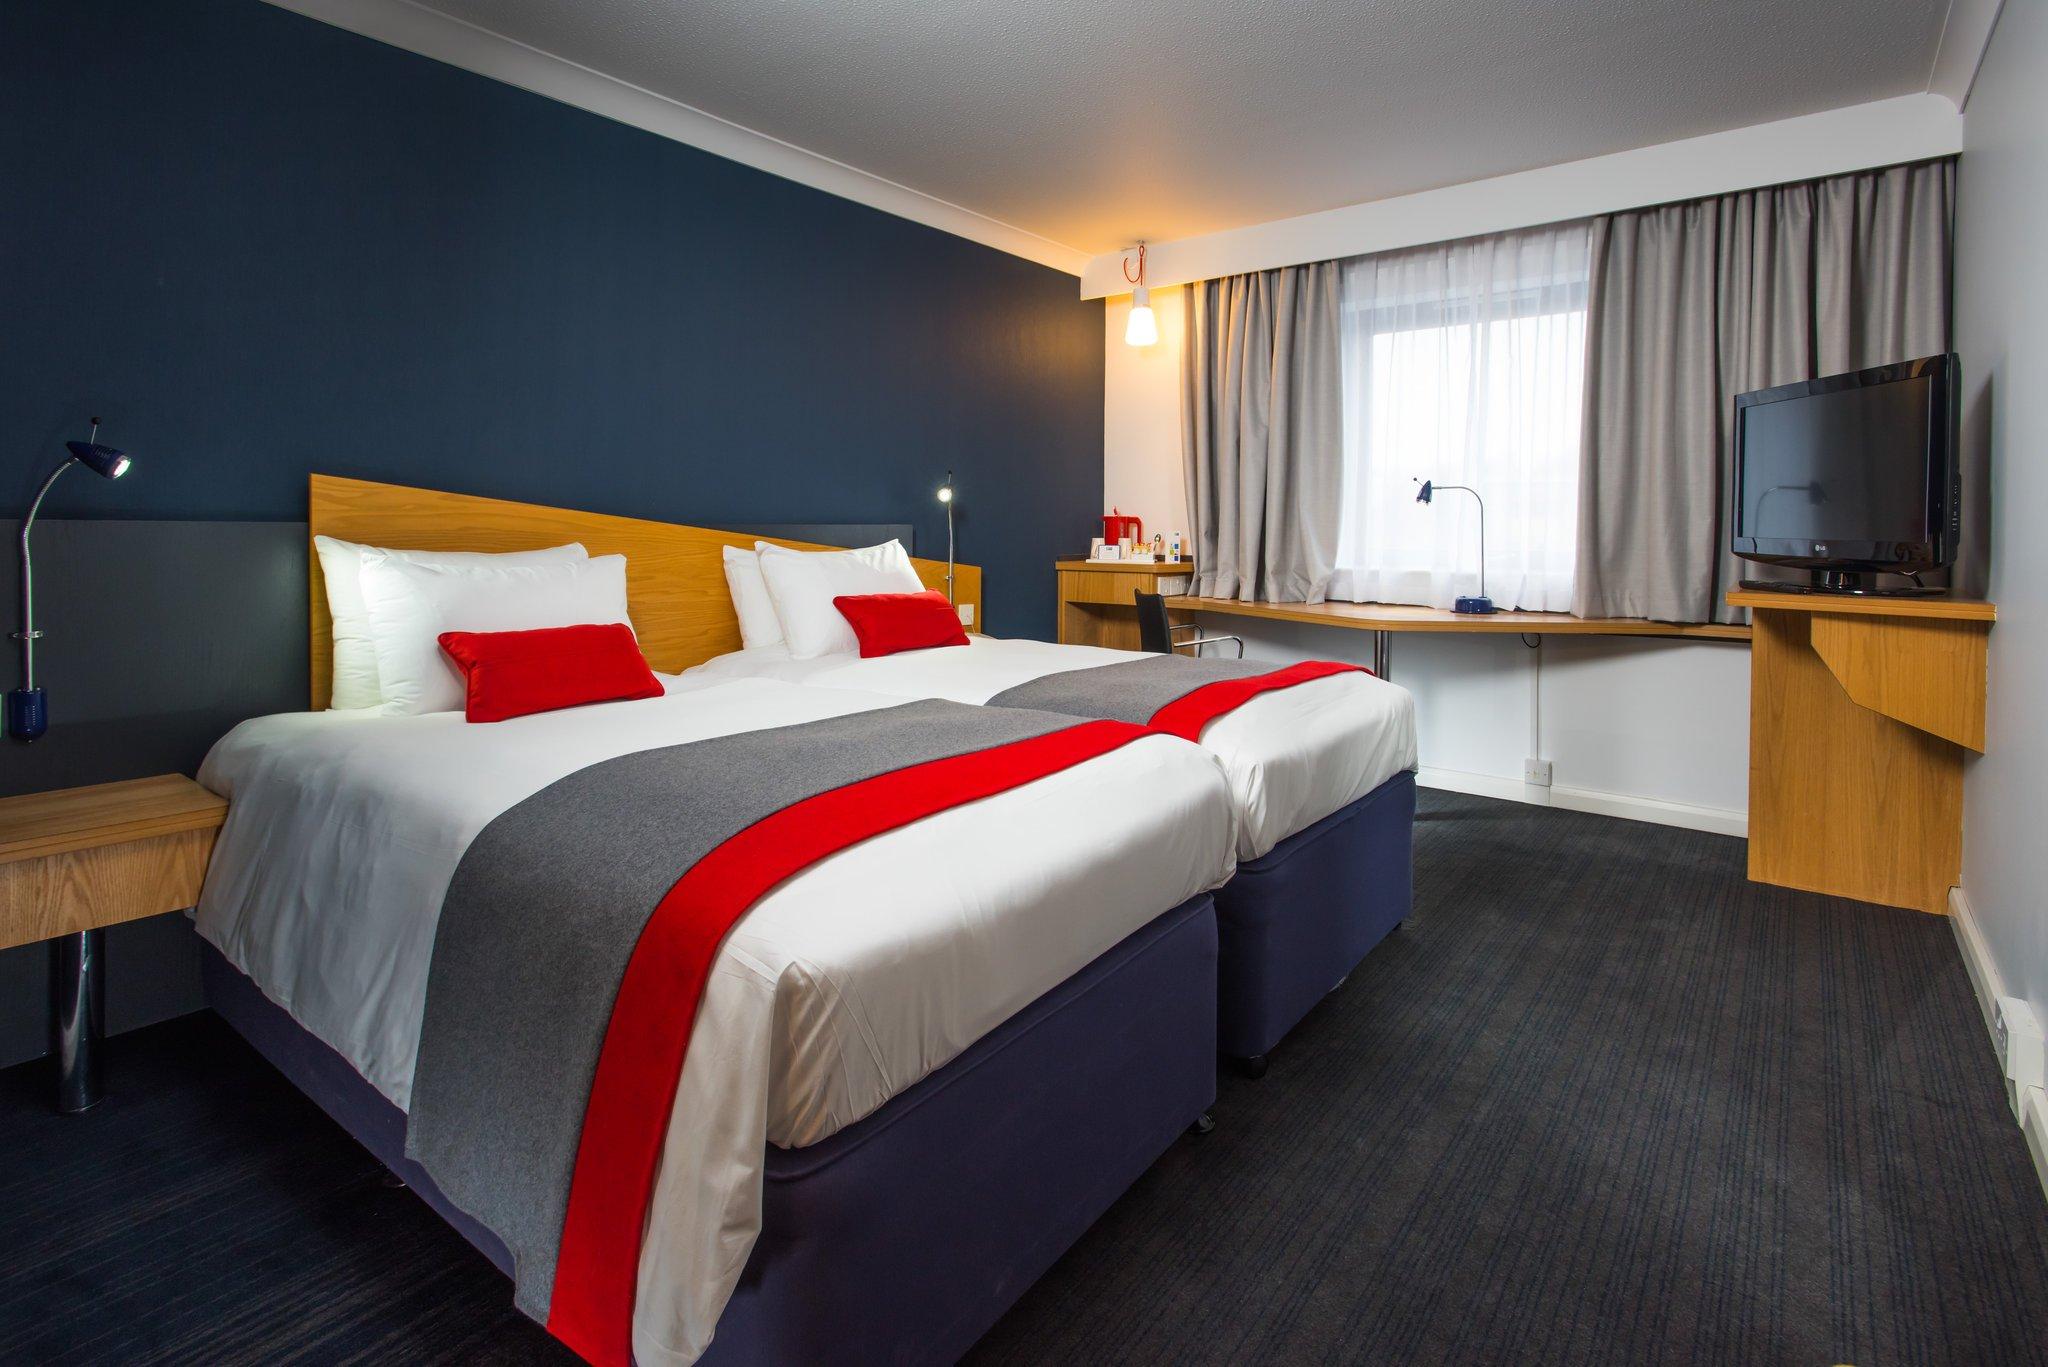 Holiday Inn Express Taunton M5 Jct 25